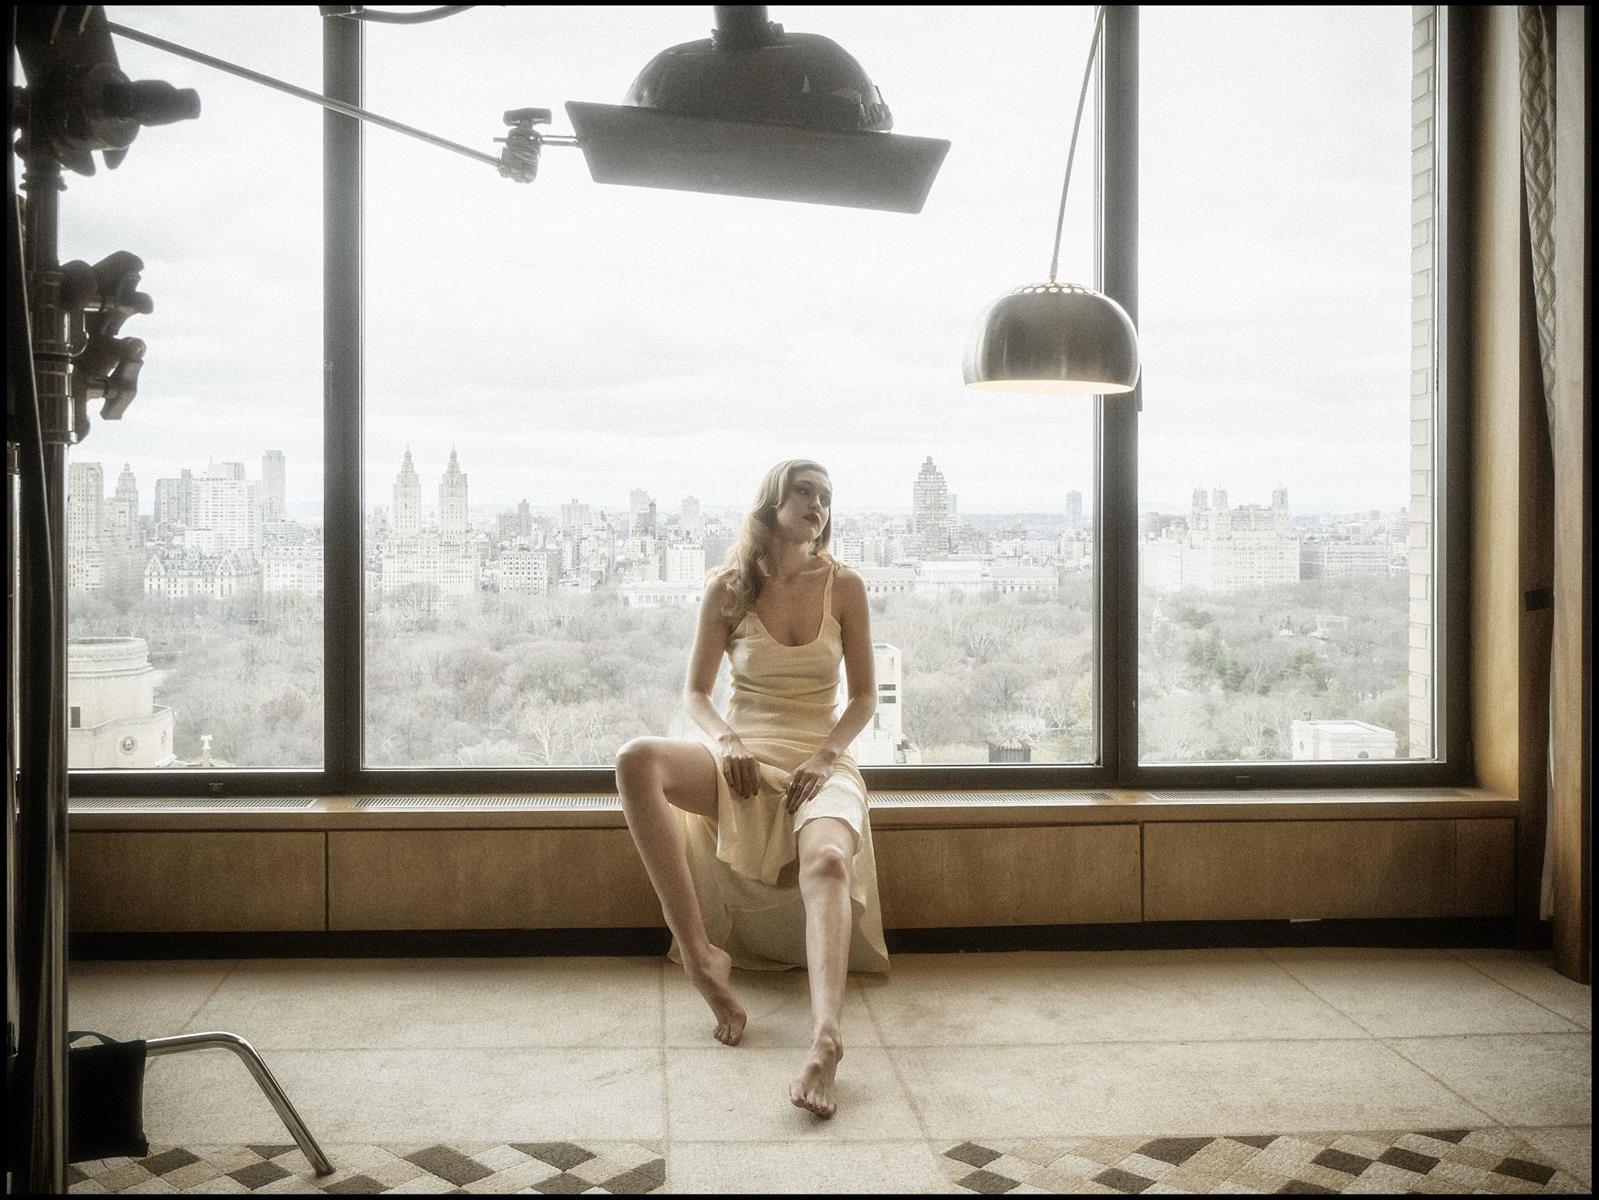 Laetitia casta topless dans le grand appartement - 1 1